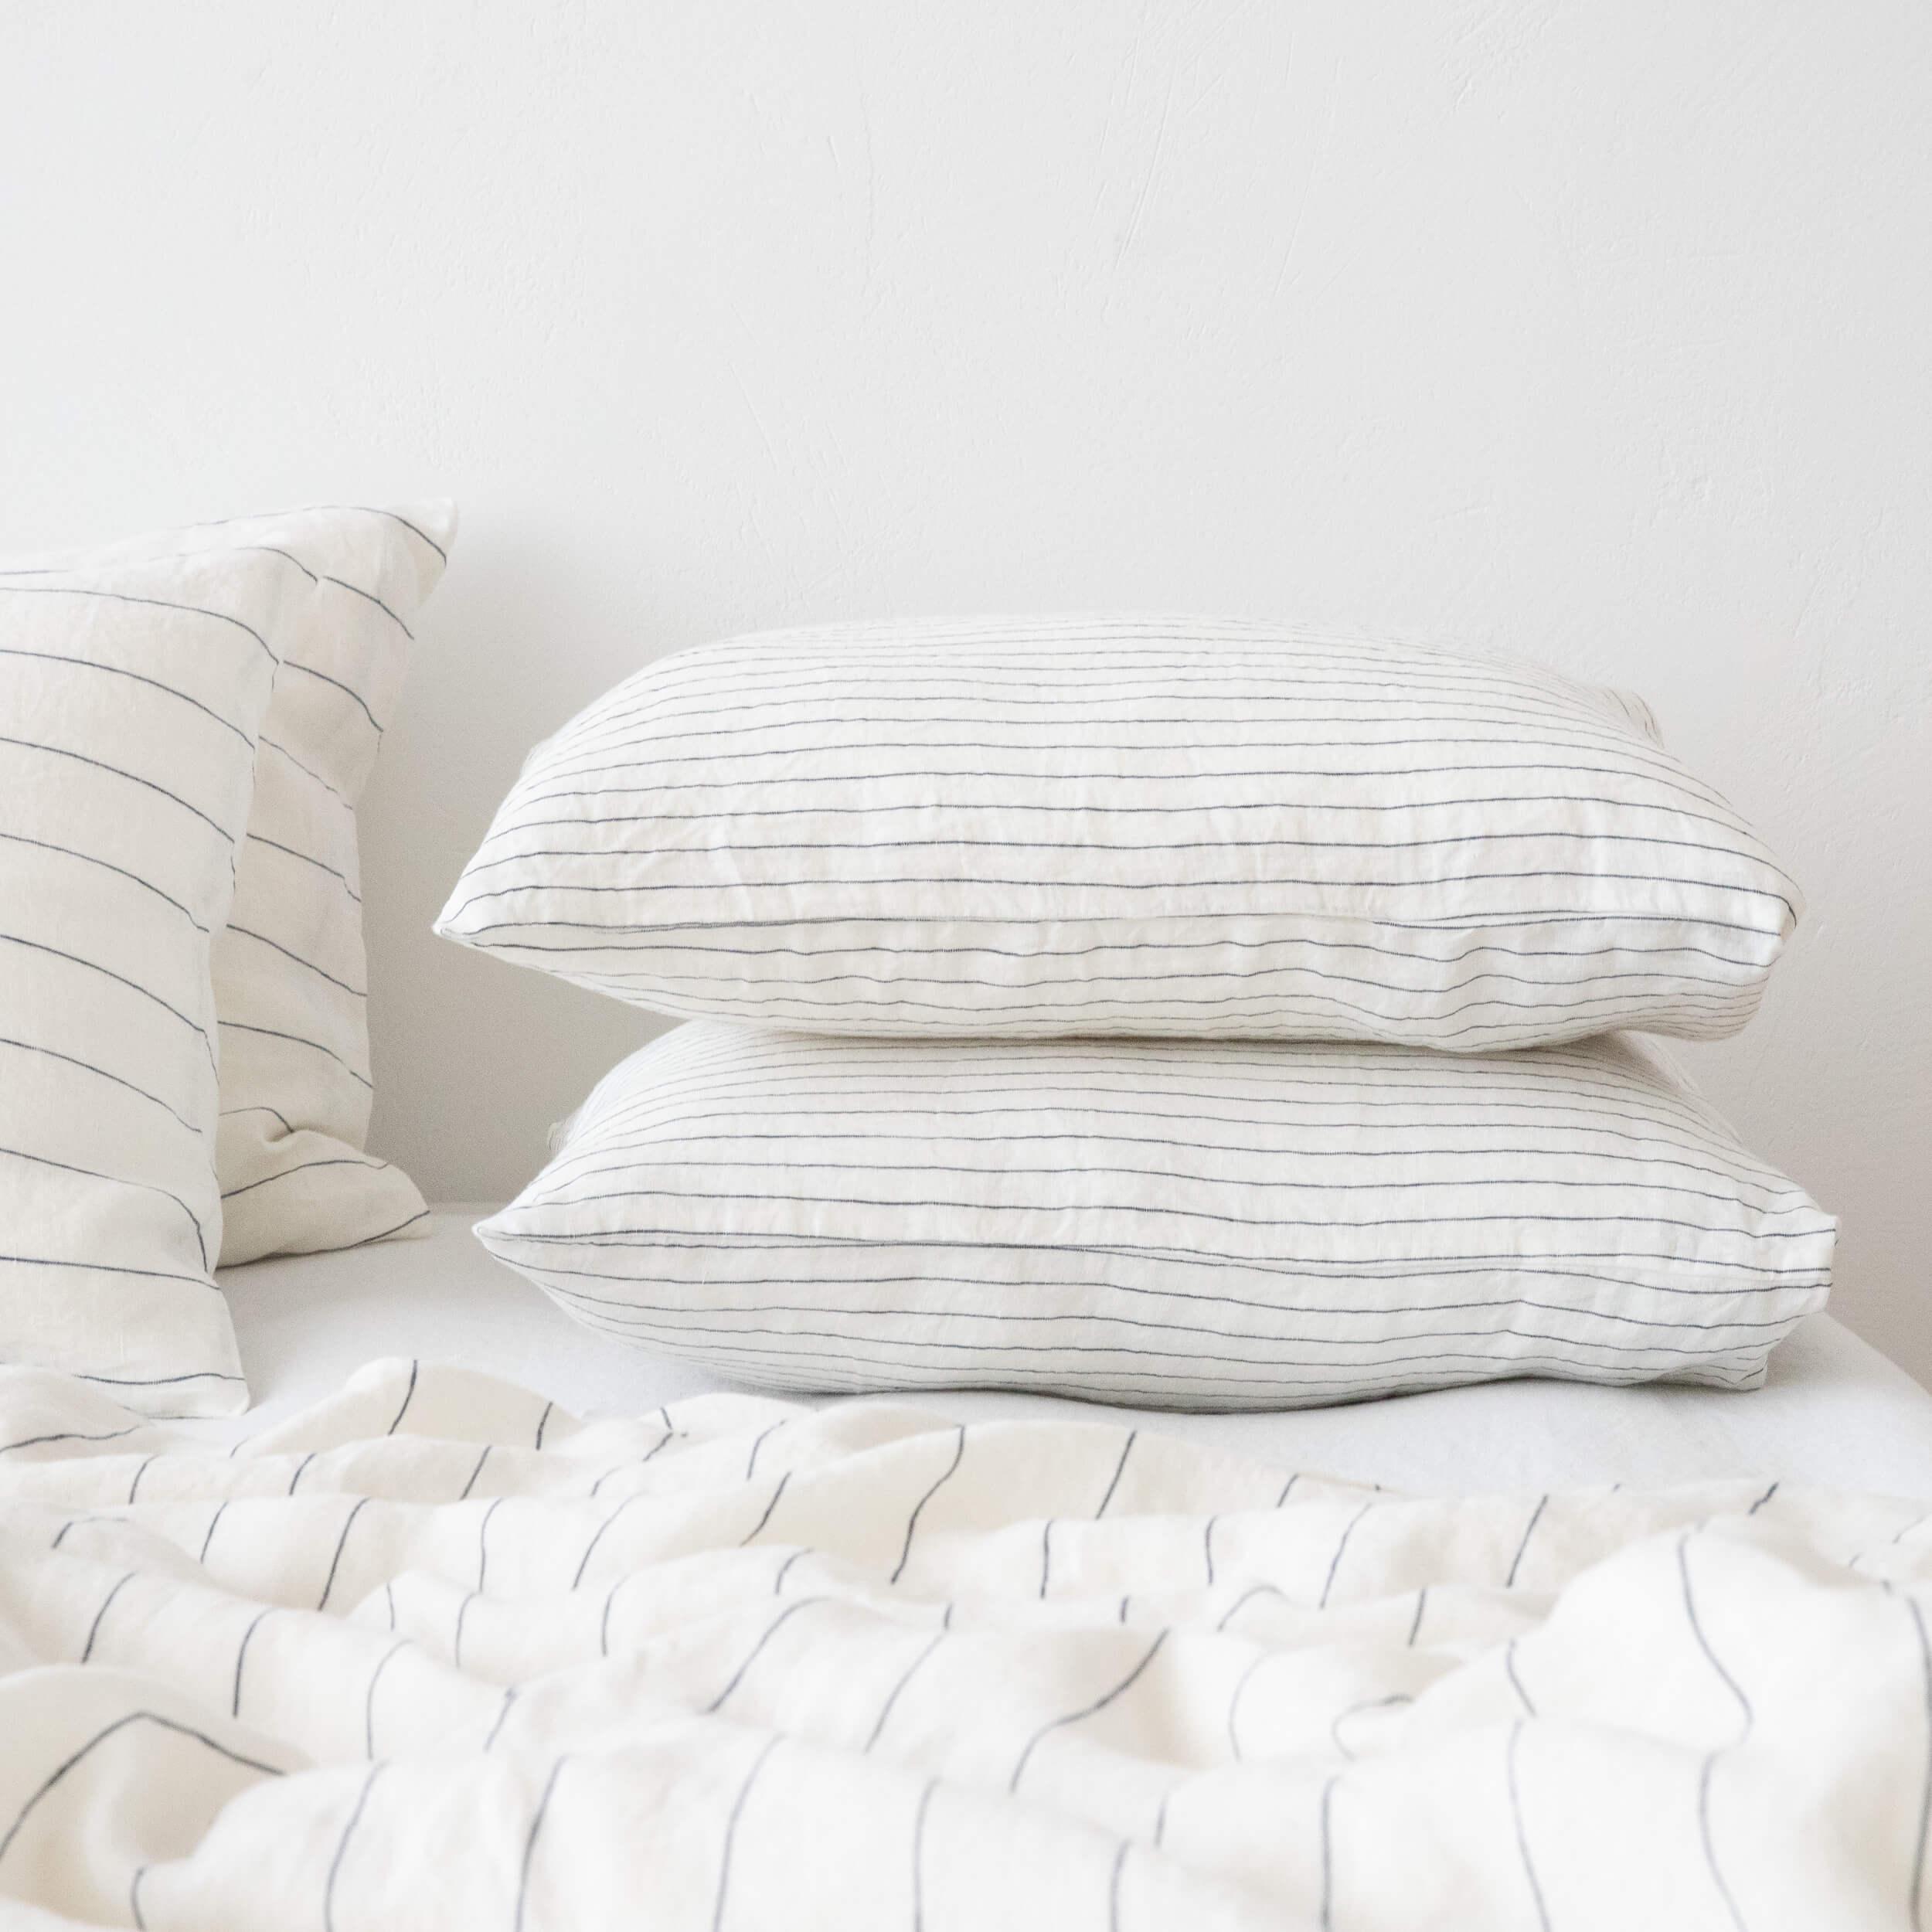 patterned linen bedding